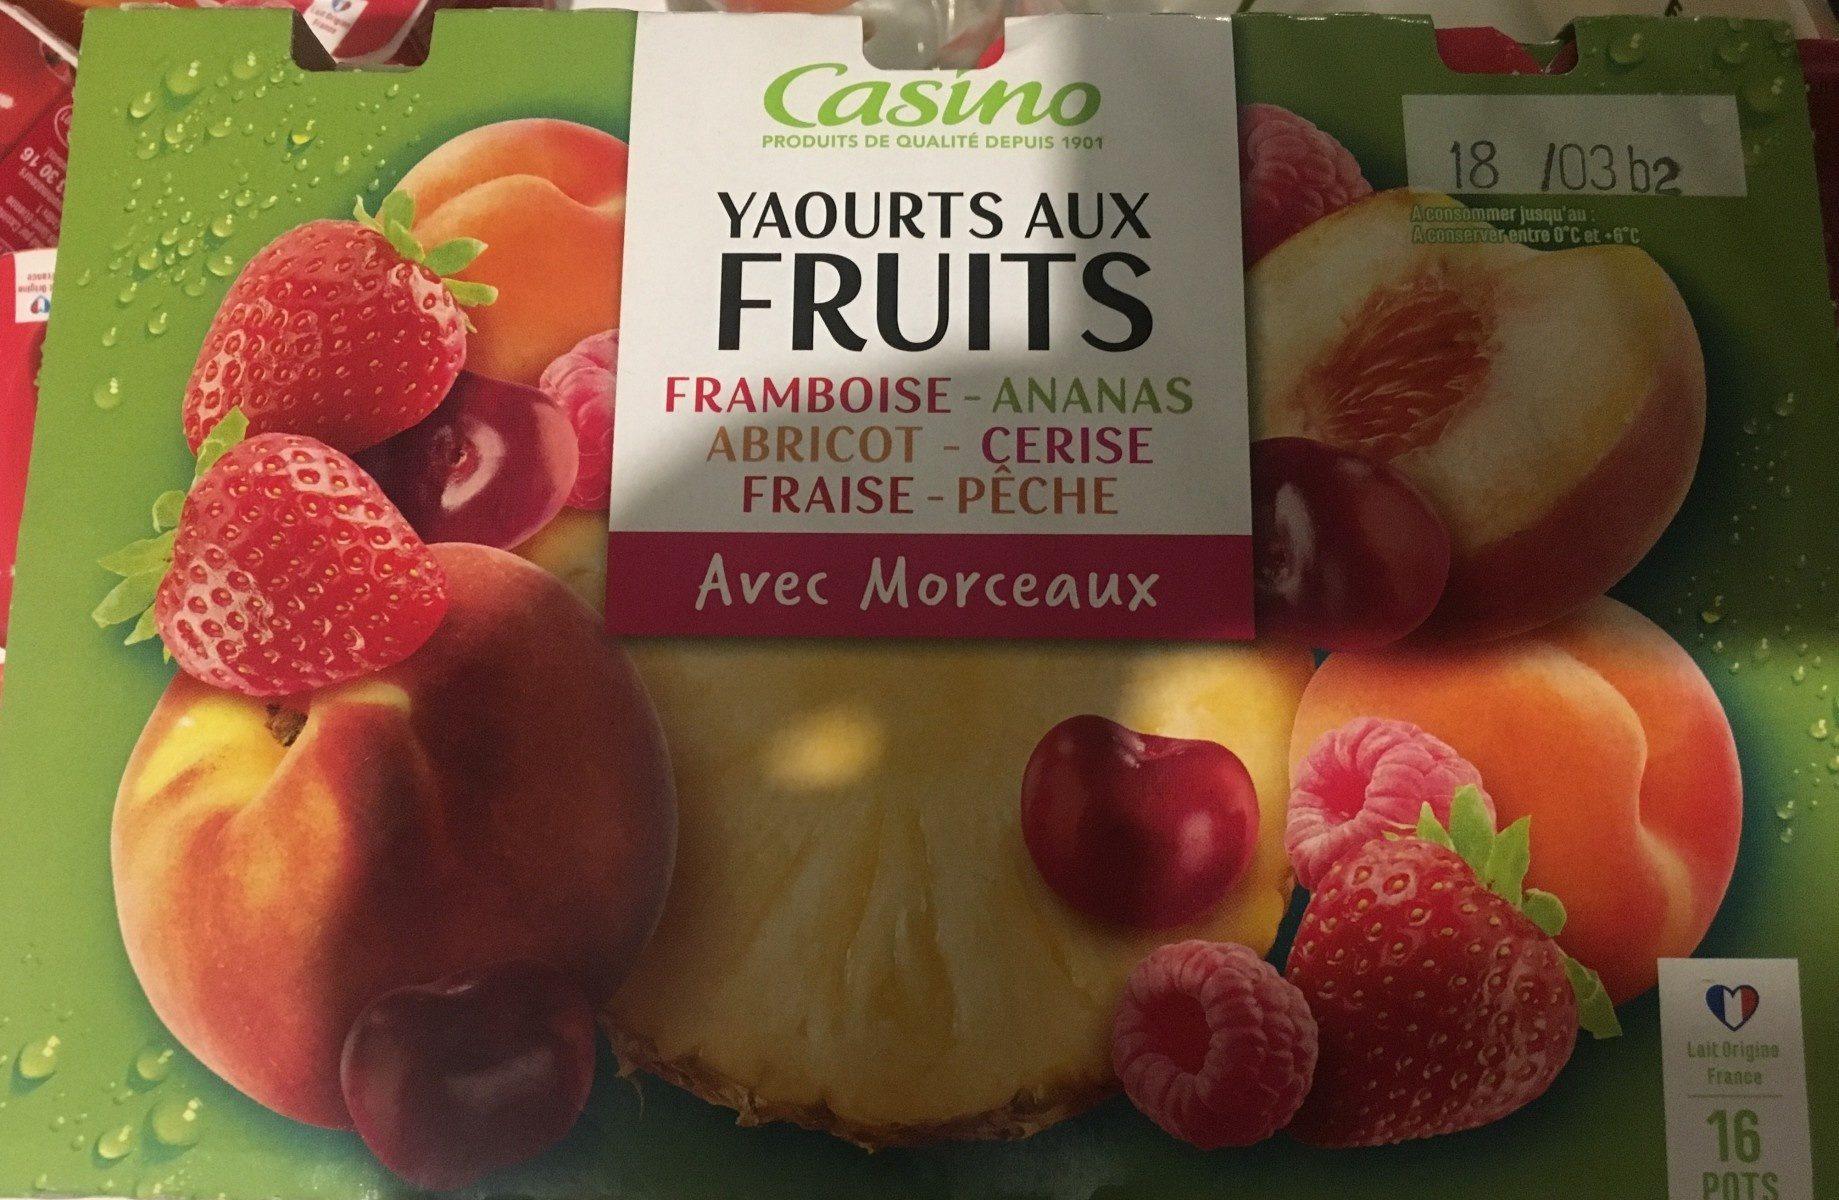 Yaourts aux fruits - Framboise, ananas, abricot, cerise, fraise, pêche - Product